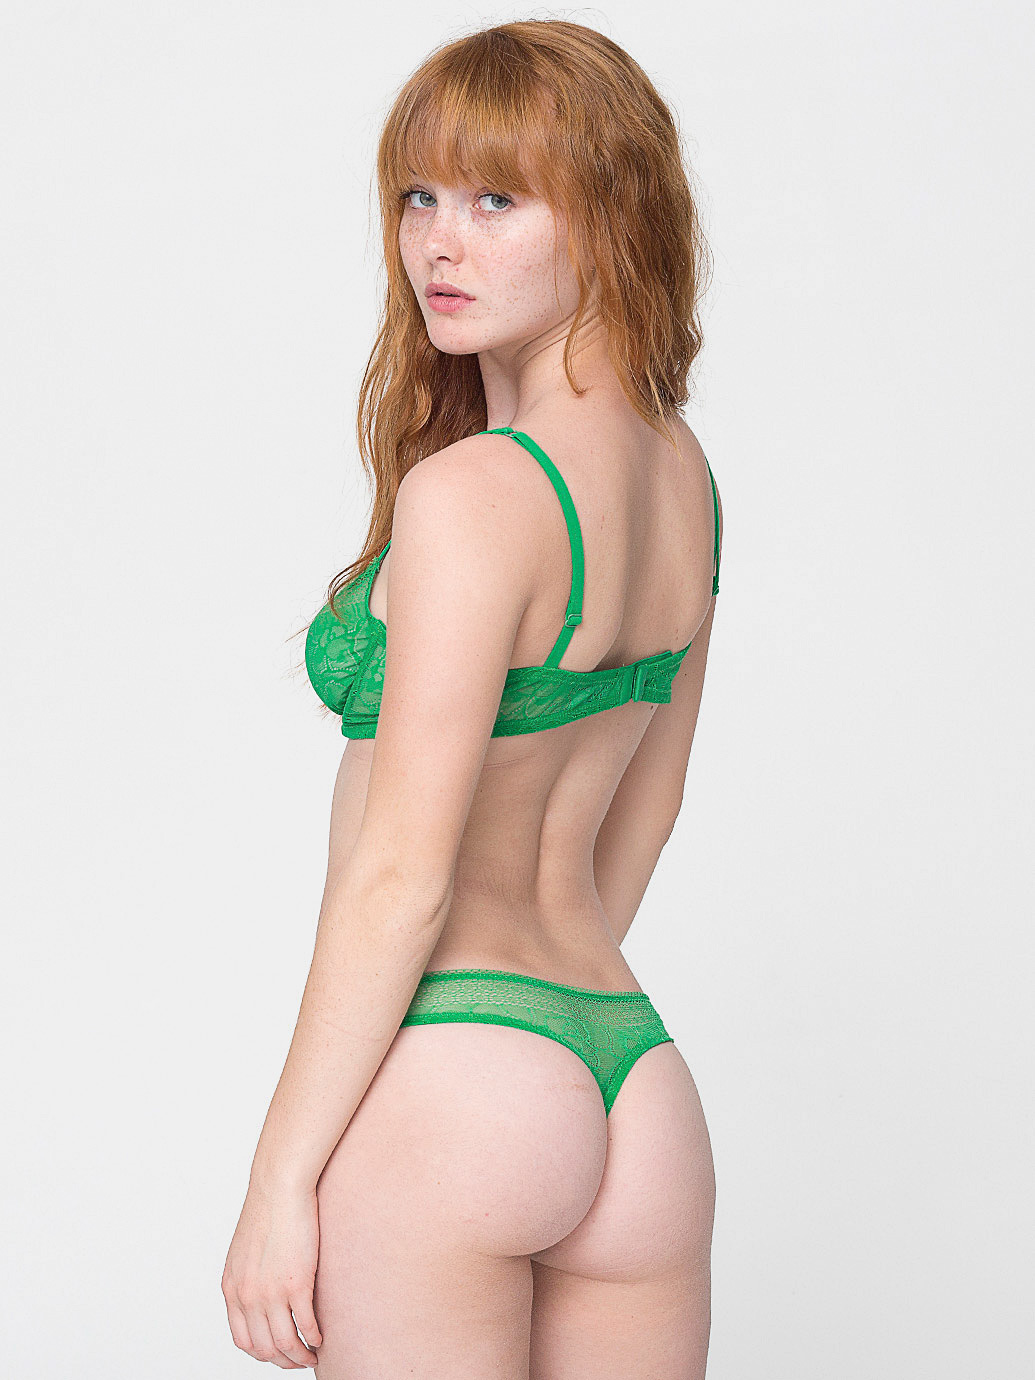 Hot Kacy Hill naked (55 photo), Topless, Paparazzi, Selfie, butt 2020